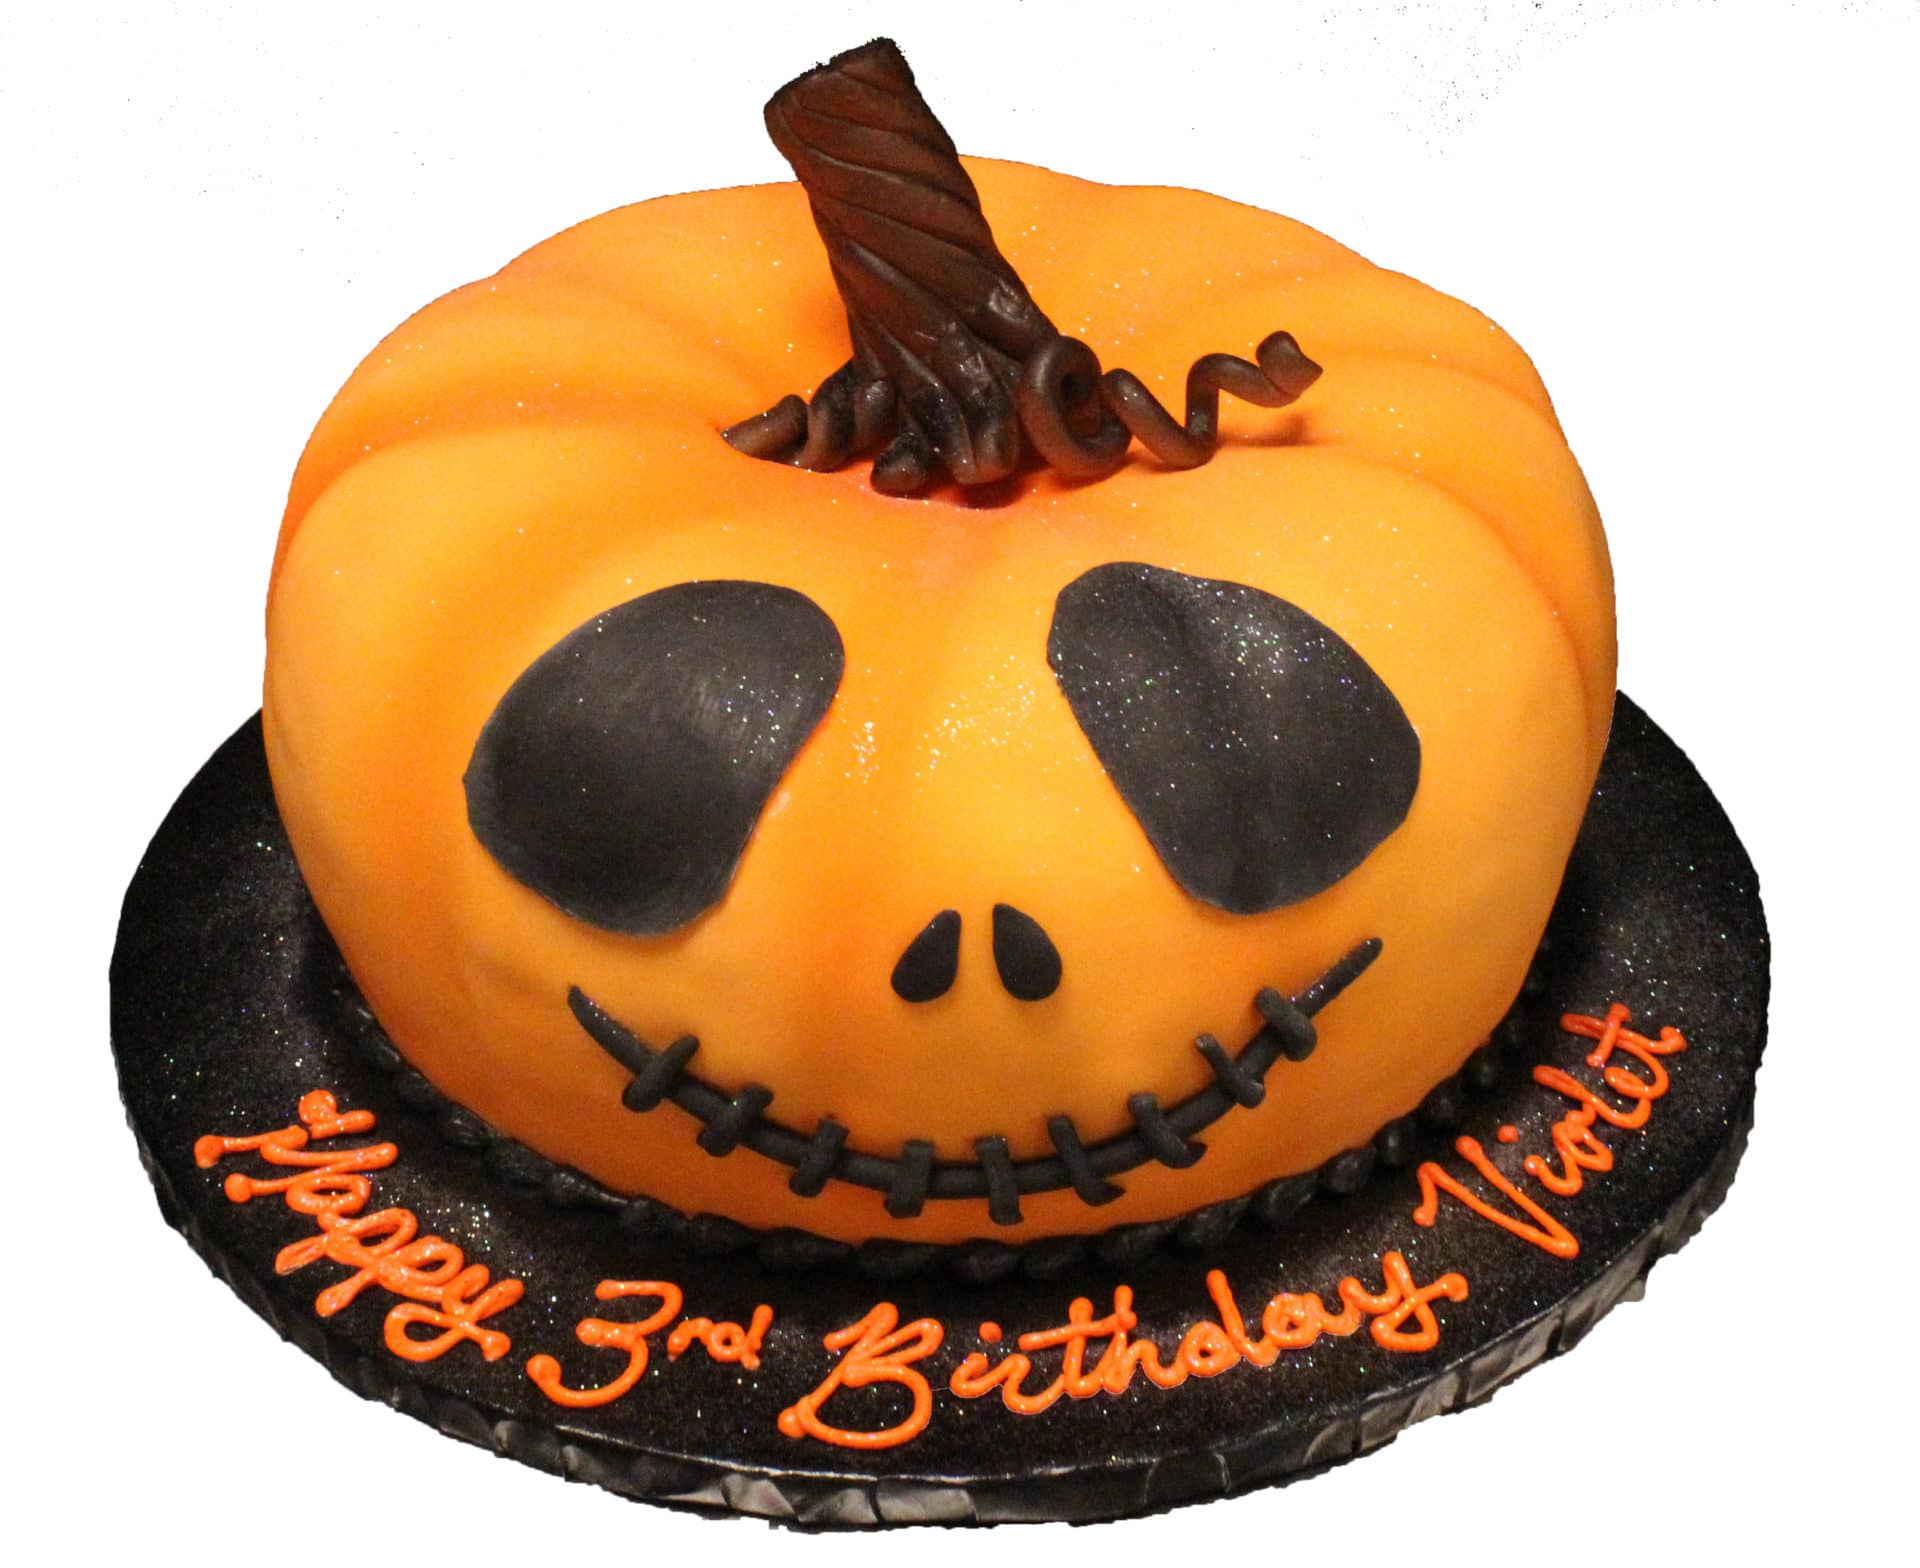 Pumpkin Halloween Cake 3d Aggie S Bakery Cake Shop